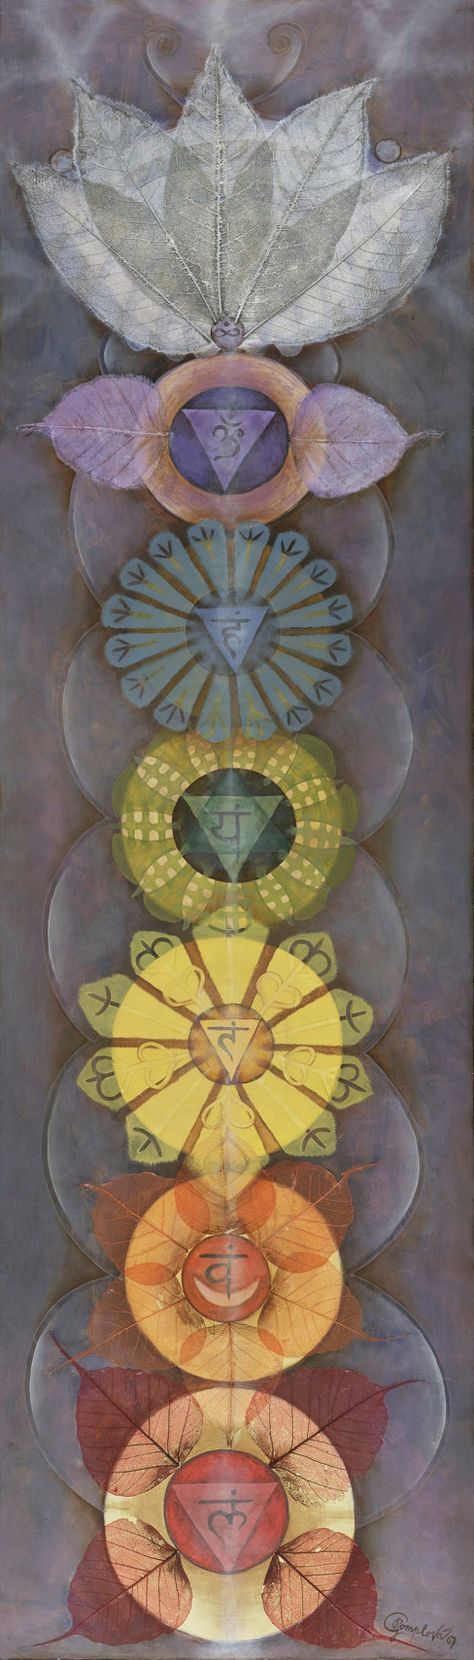 CHAKRAS energía de reiki yoga arte espiritual YOGA por GPyoga